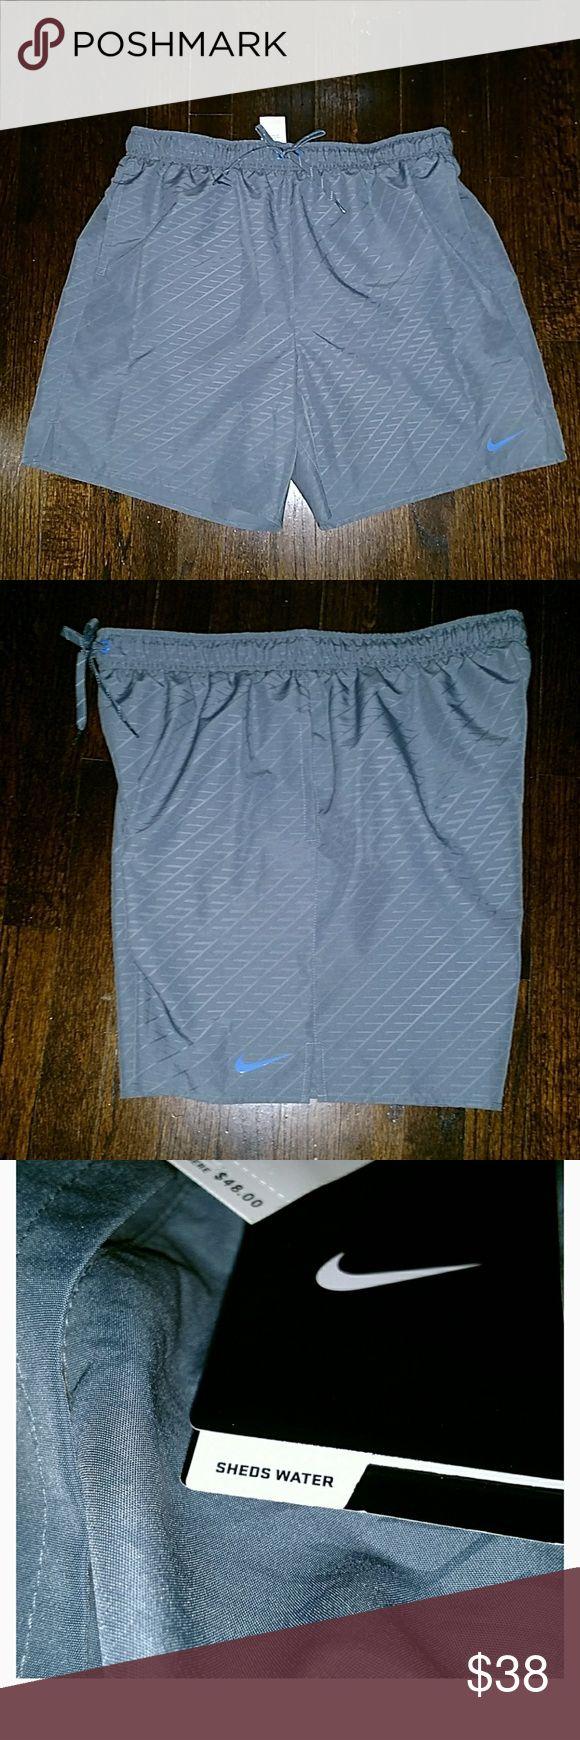 Nike Swim Shorts Blue swim shorts with funtional pockets. Adjustable string waist. New never worn. Nike Swim